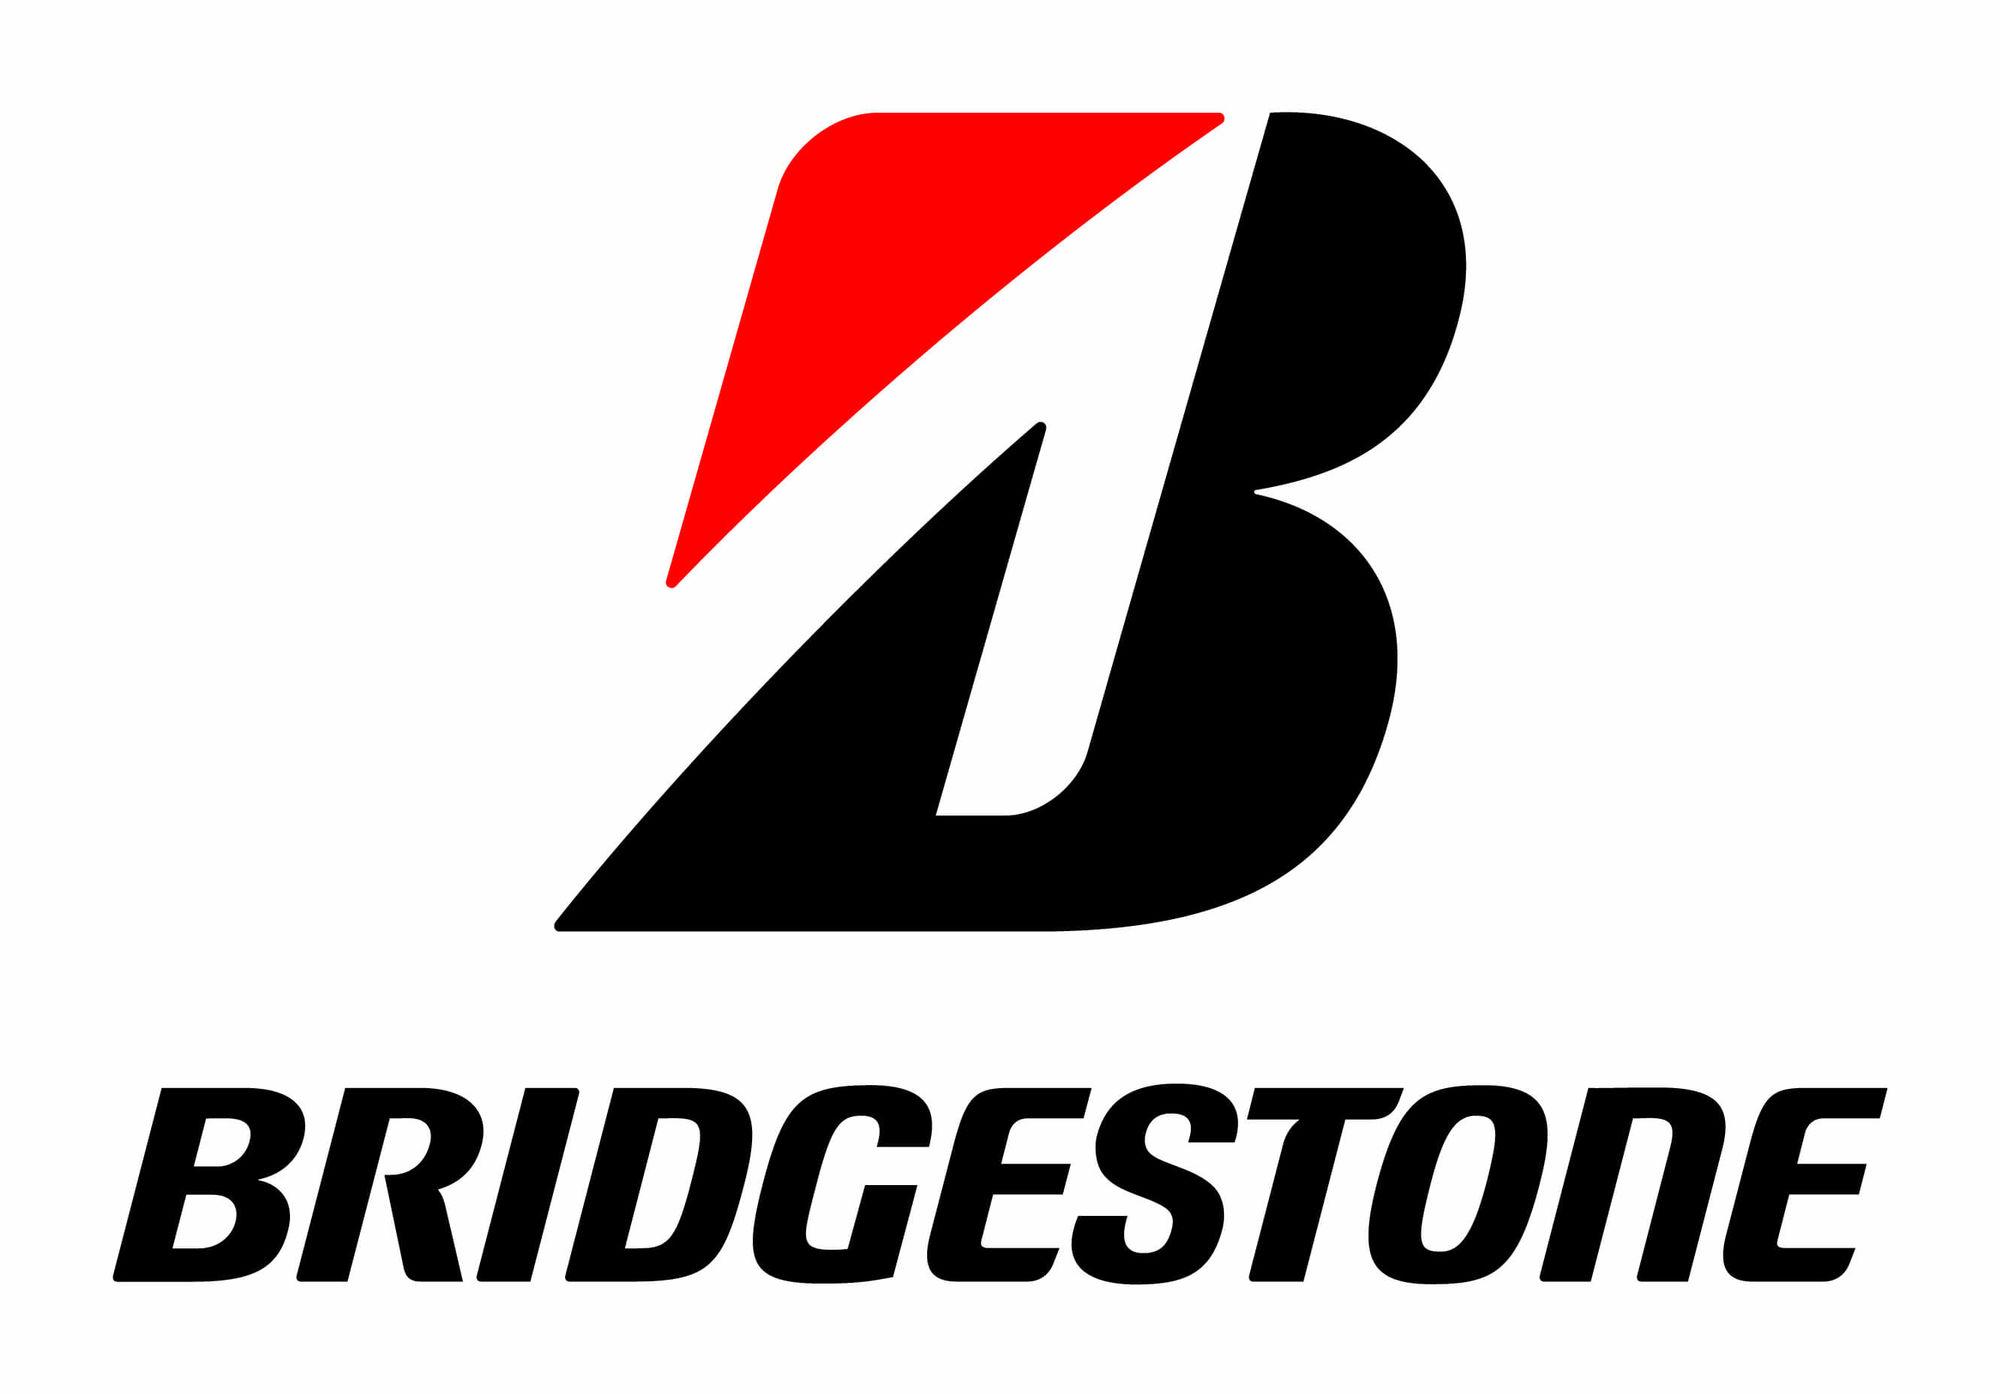 Télephone information entreprise  Bridgestone